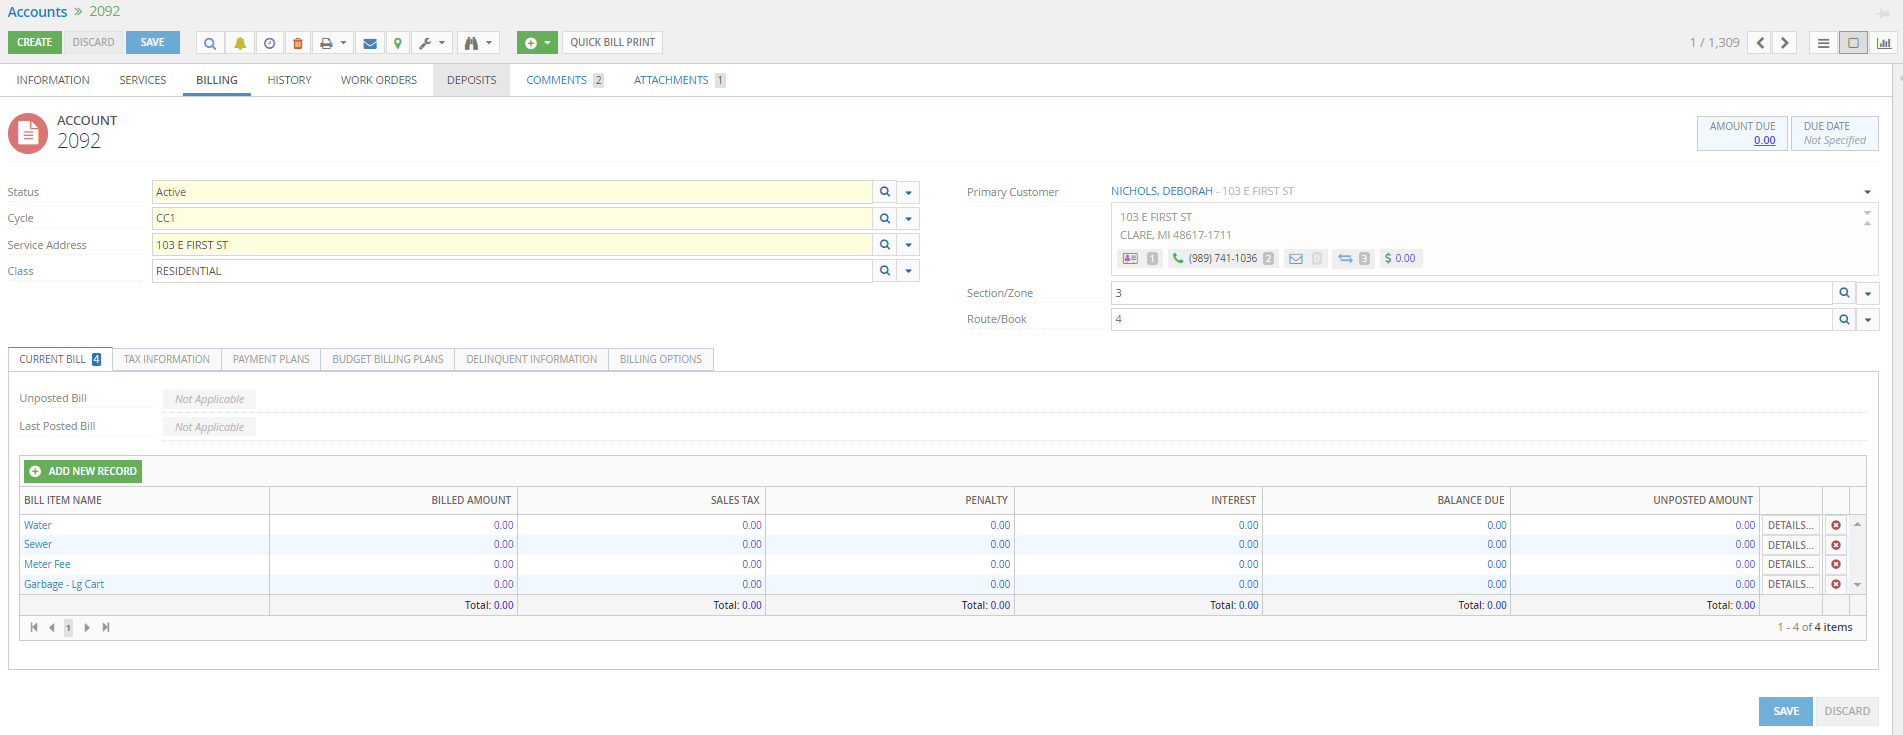 UB Accounts Screen screenshot